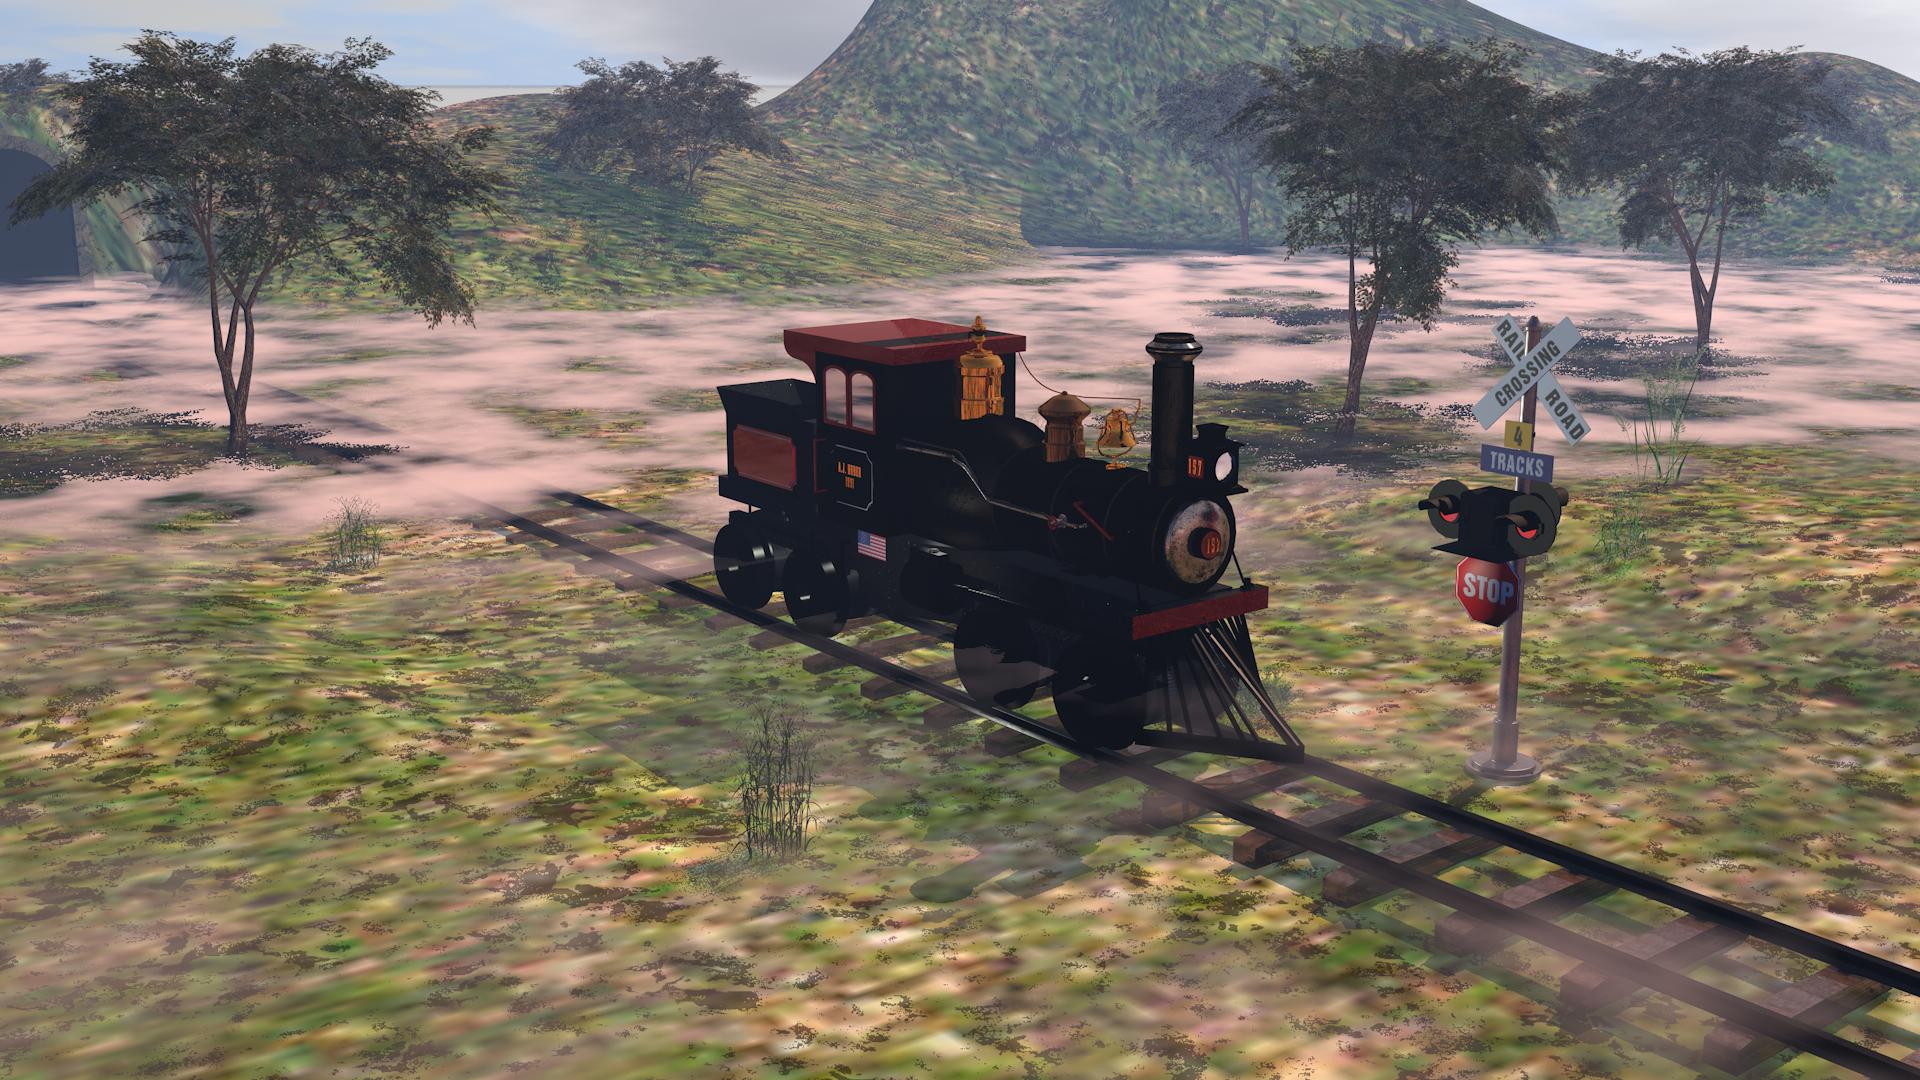 steam locomotive railway in Cinema 4d maxwell render image